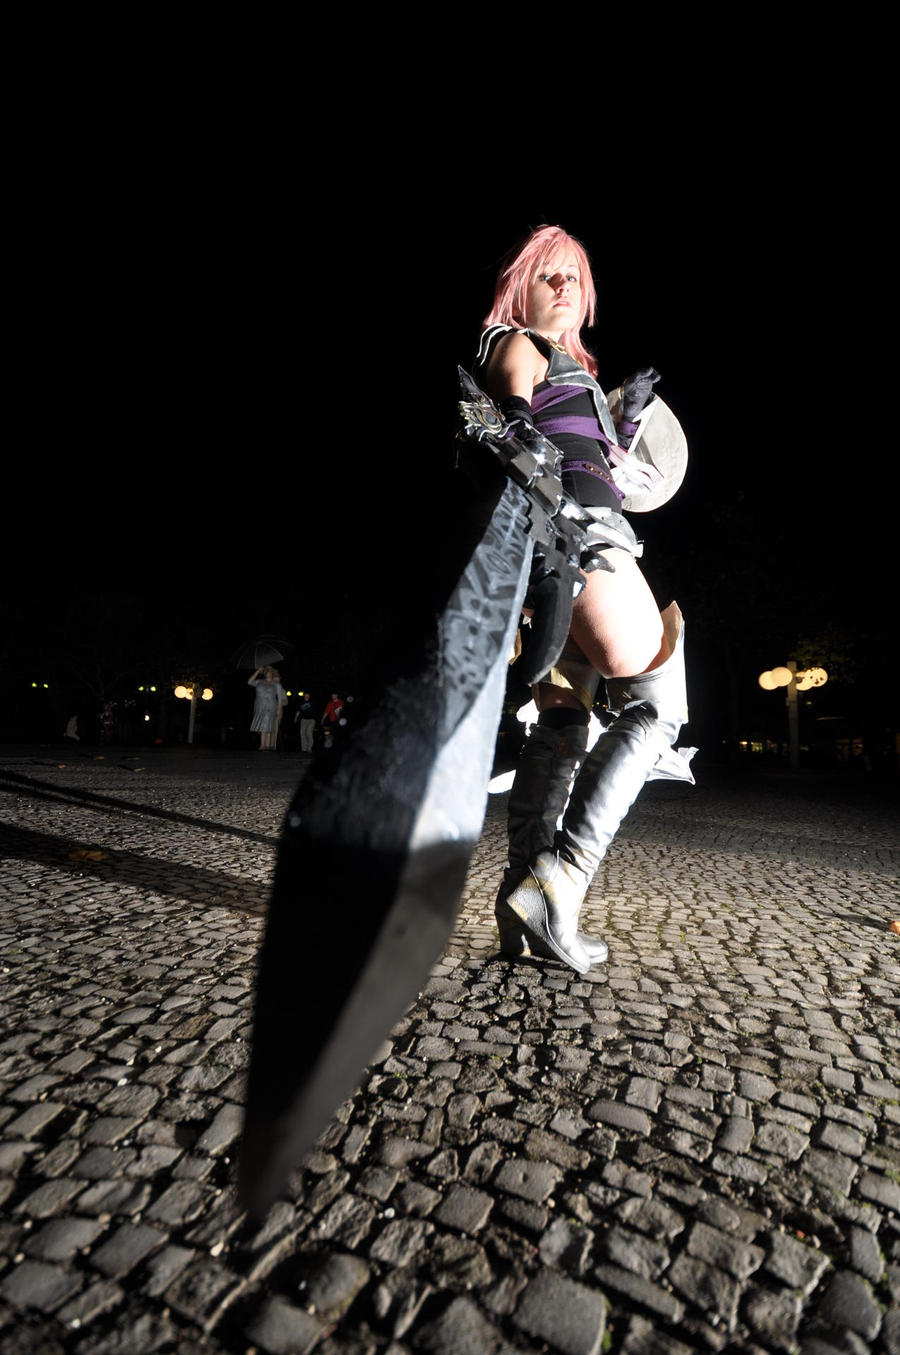 Lightning Cosplay at Animaco 2012 by DYuki